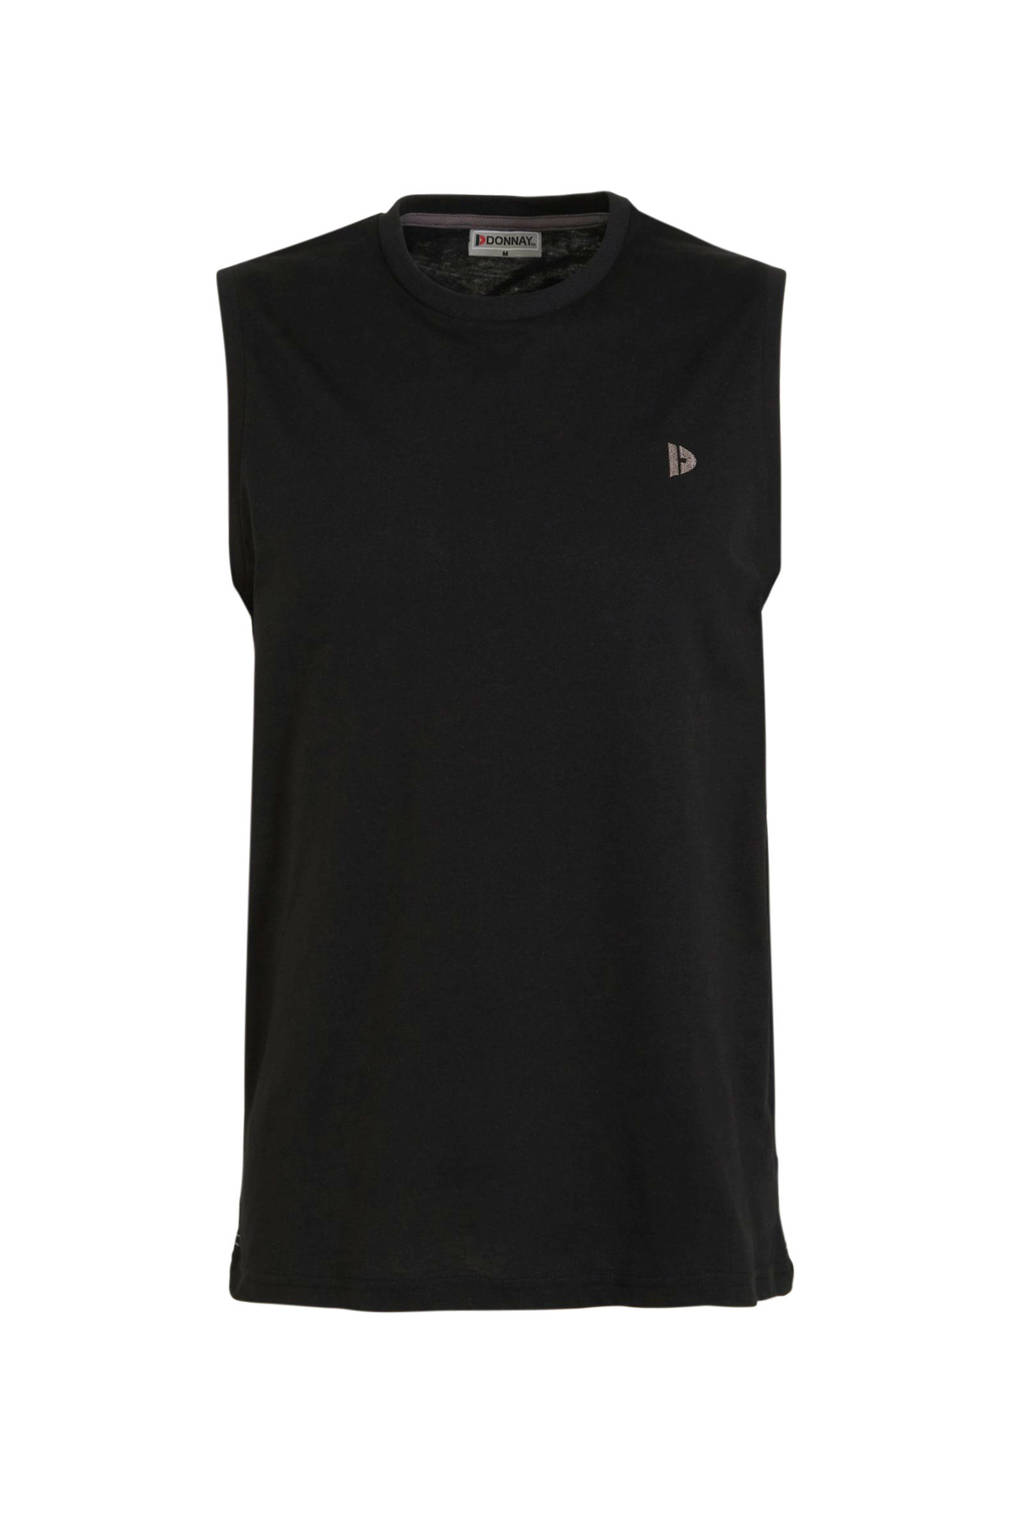 Donnay   sportsinglet zwart, Zwart